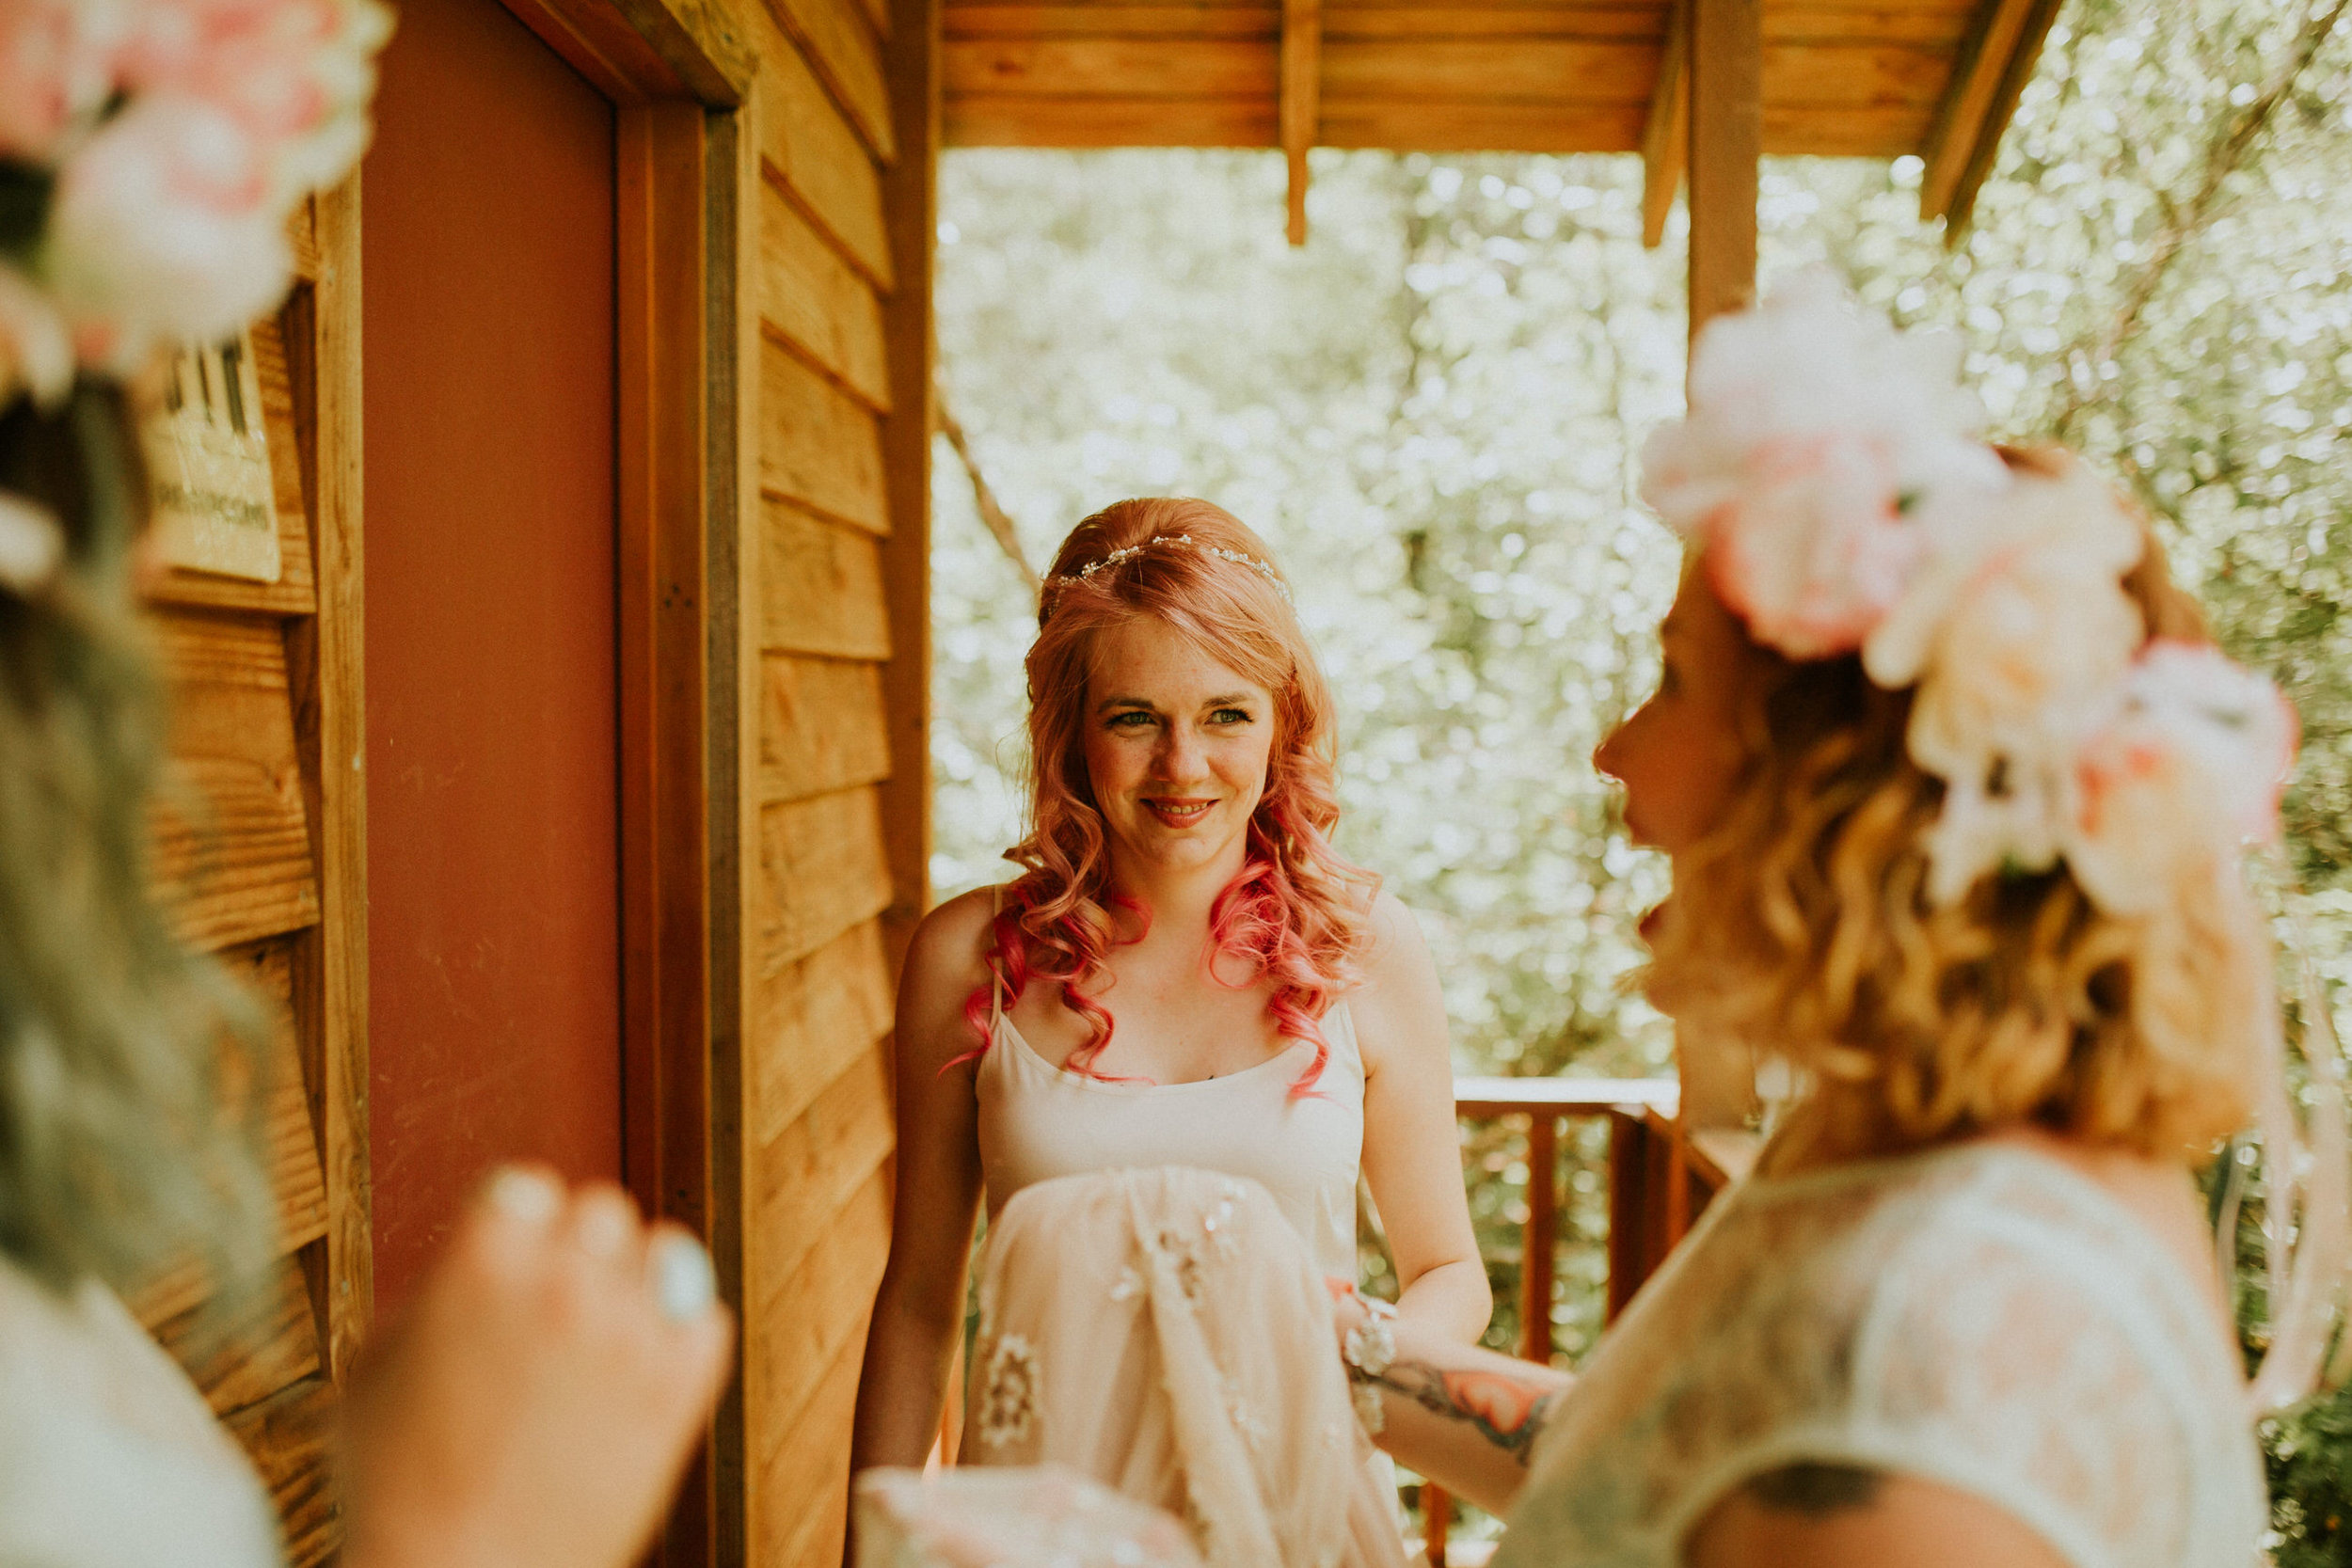 PNW elopement photographer breeanna lasher intimate forest wedding